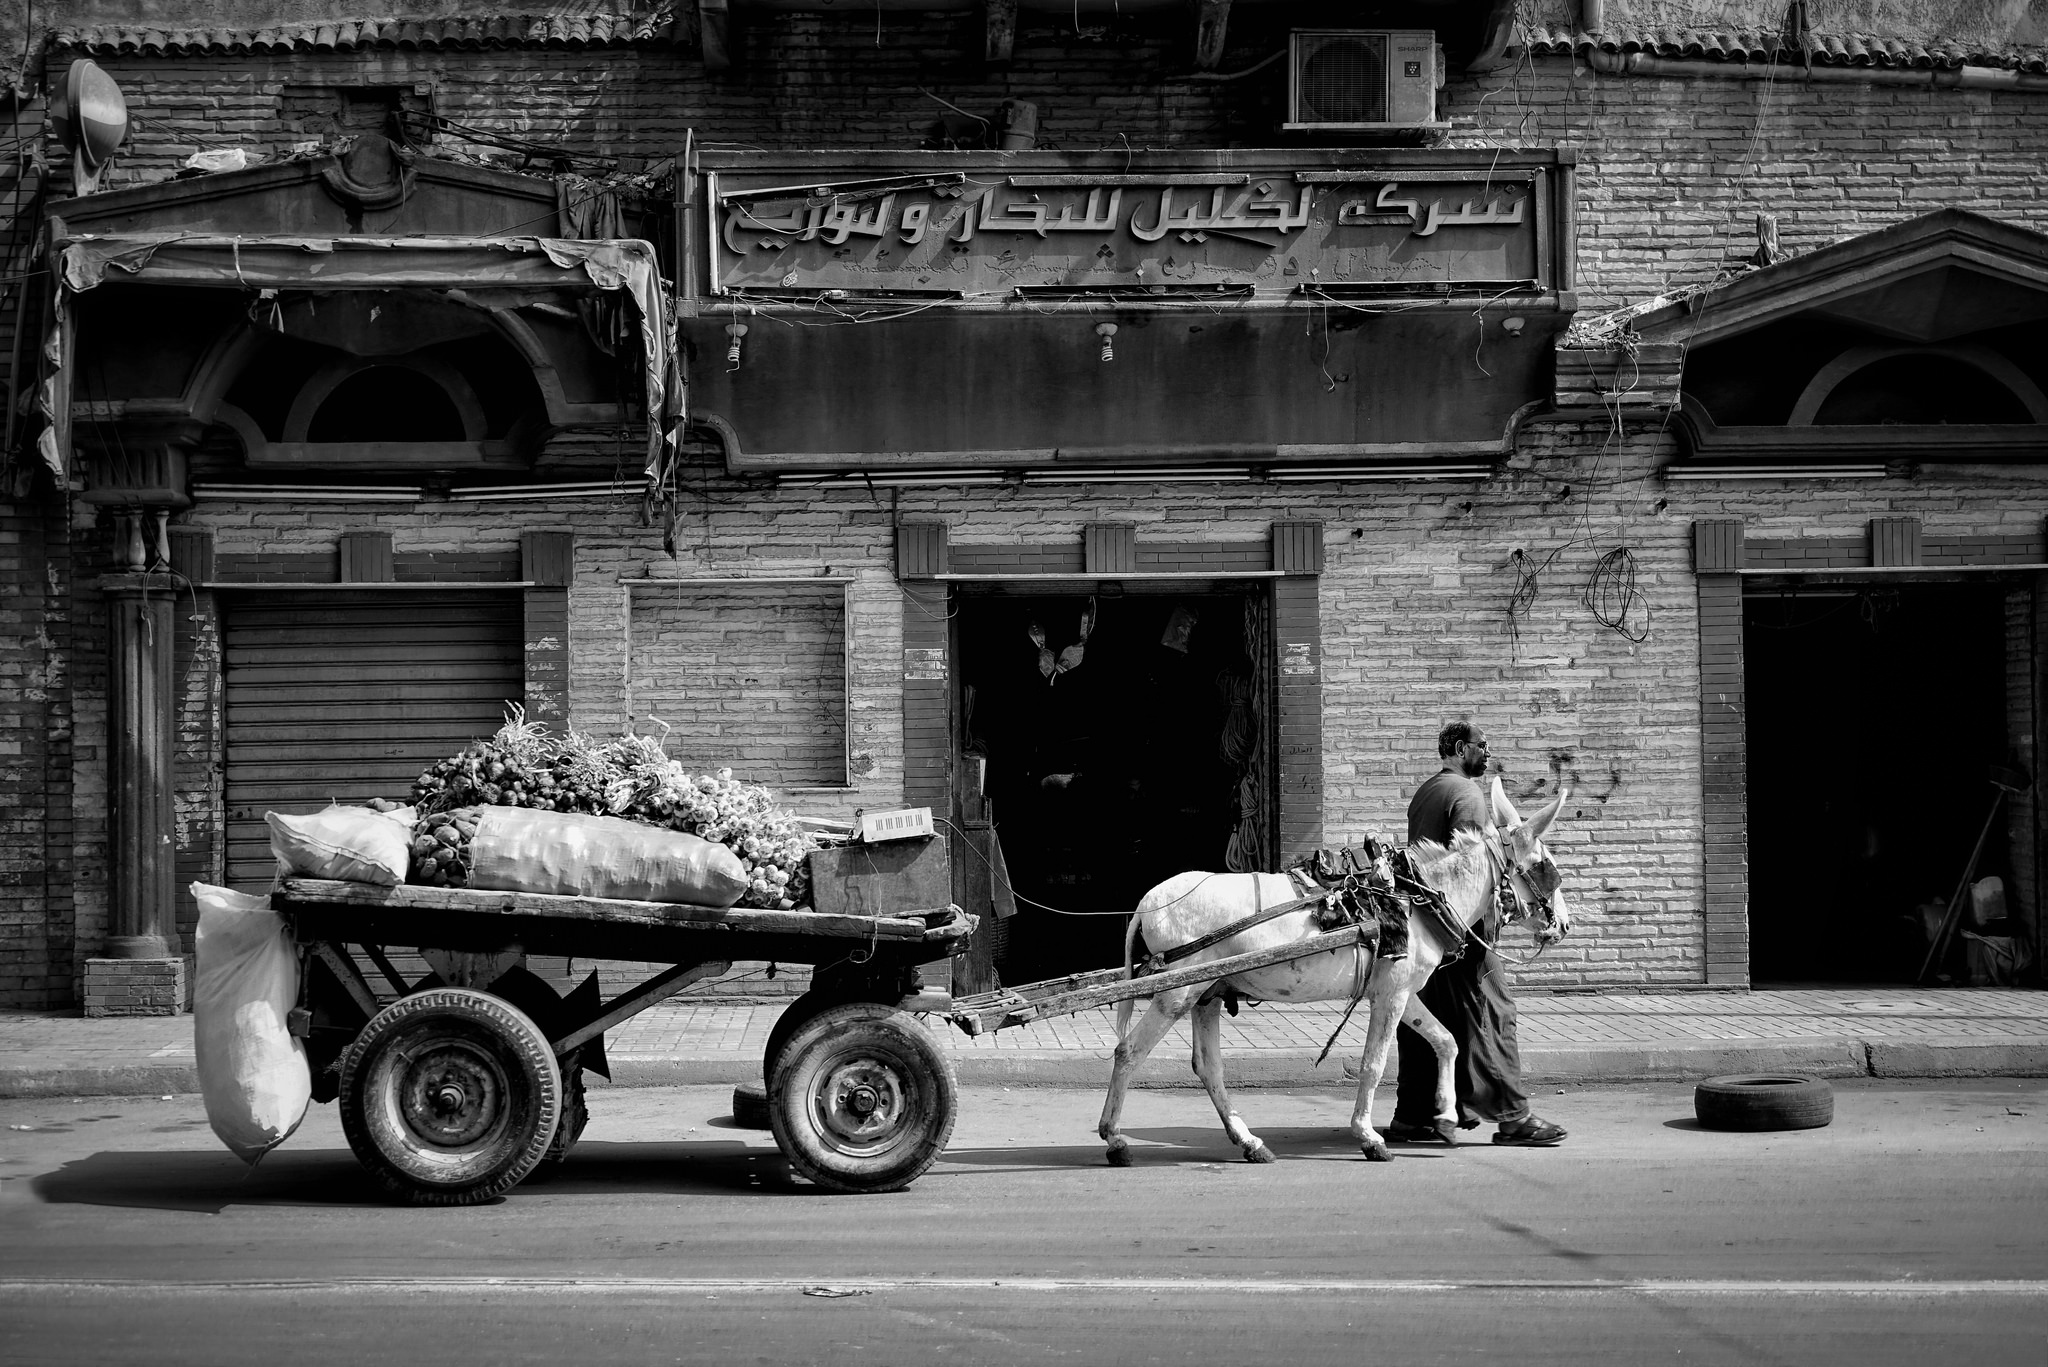 street life in Alexandria